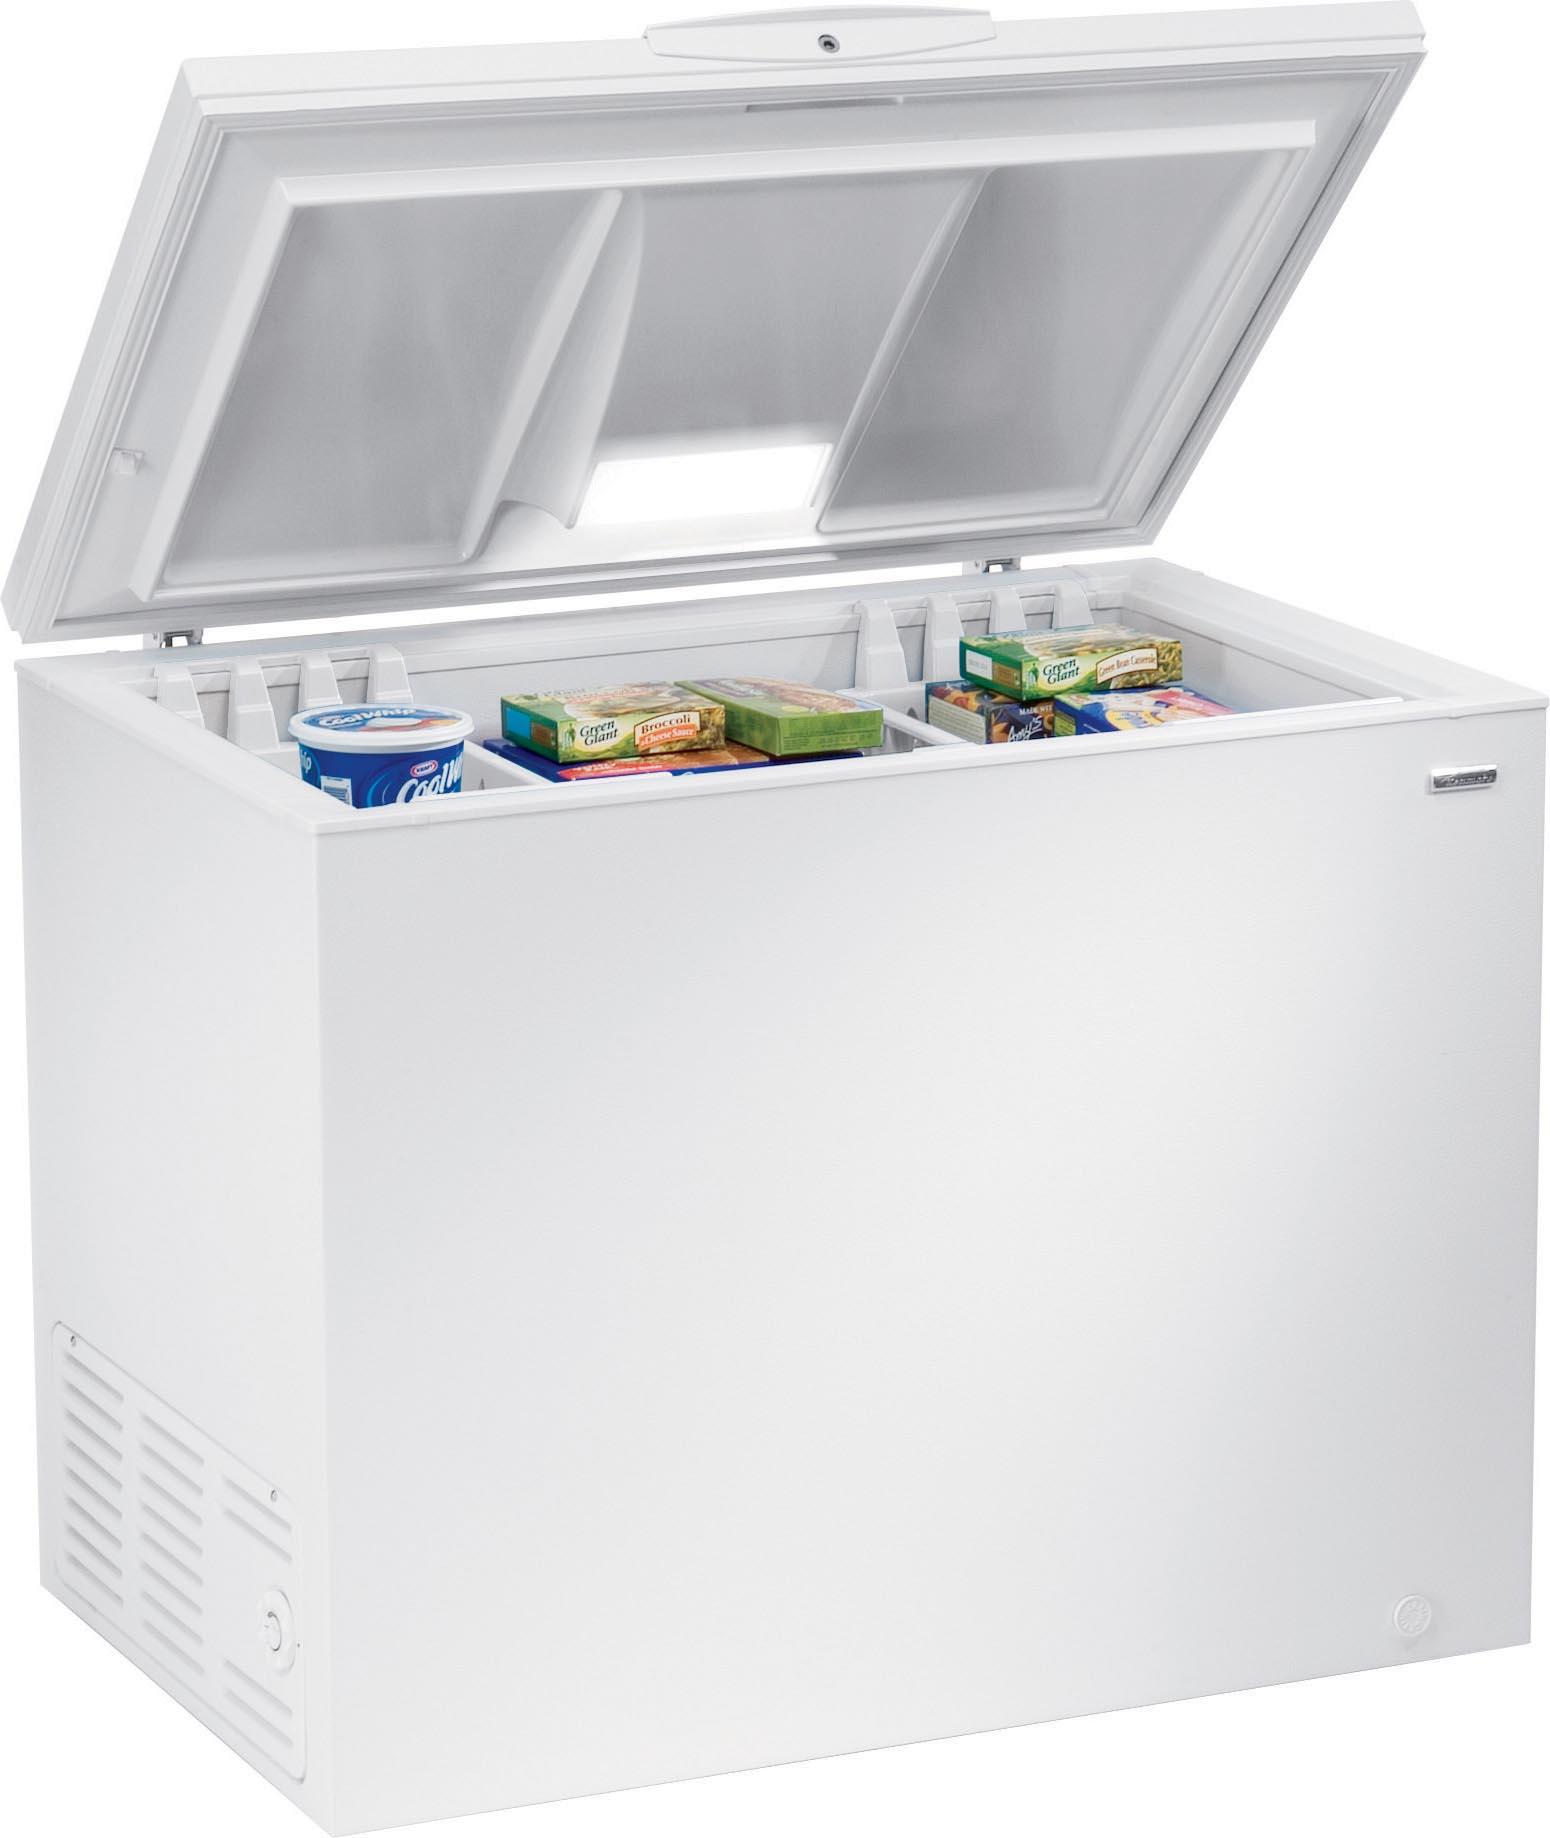 hight resolution of kenmore model 25316342101 chest freezer genuine parts kenmore freezer relays diagram kenmore chest freezer wiring diagram